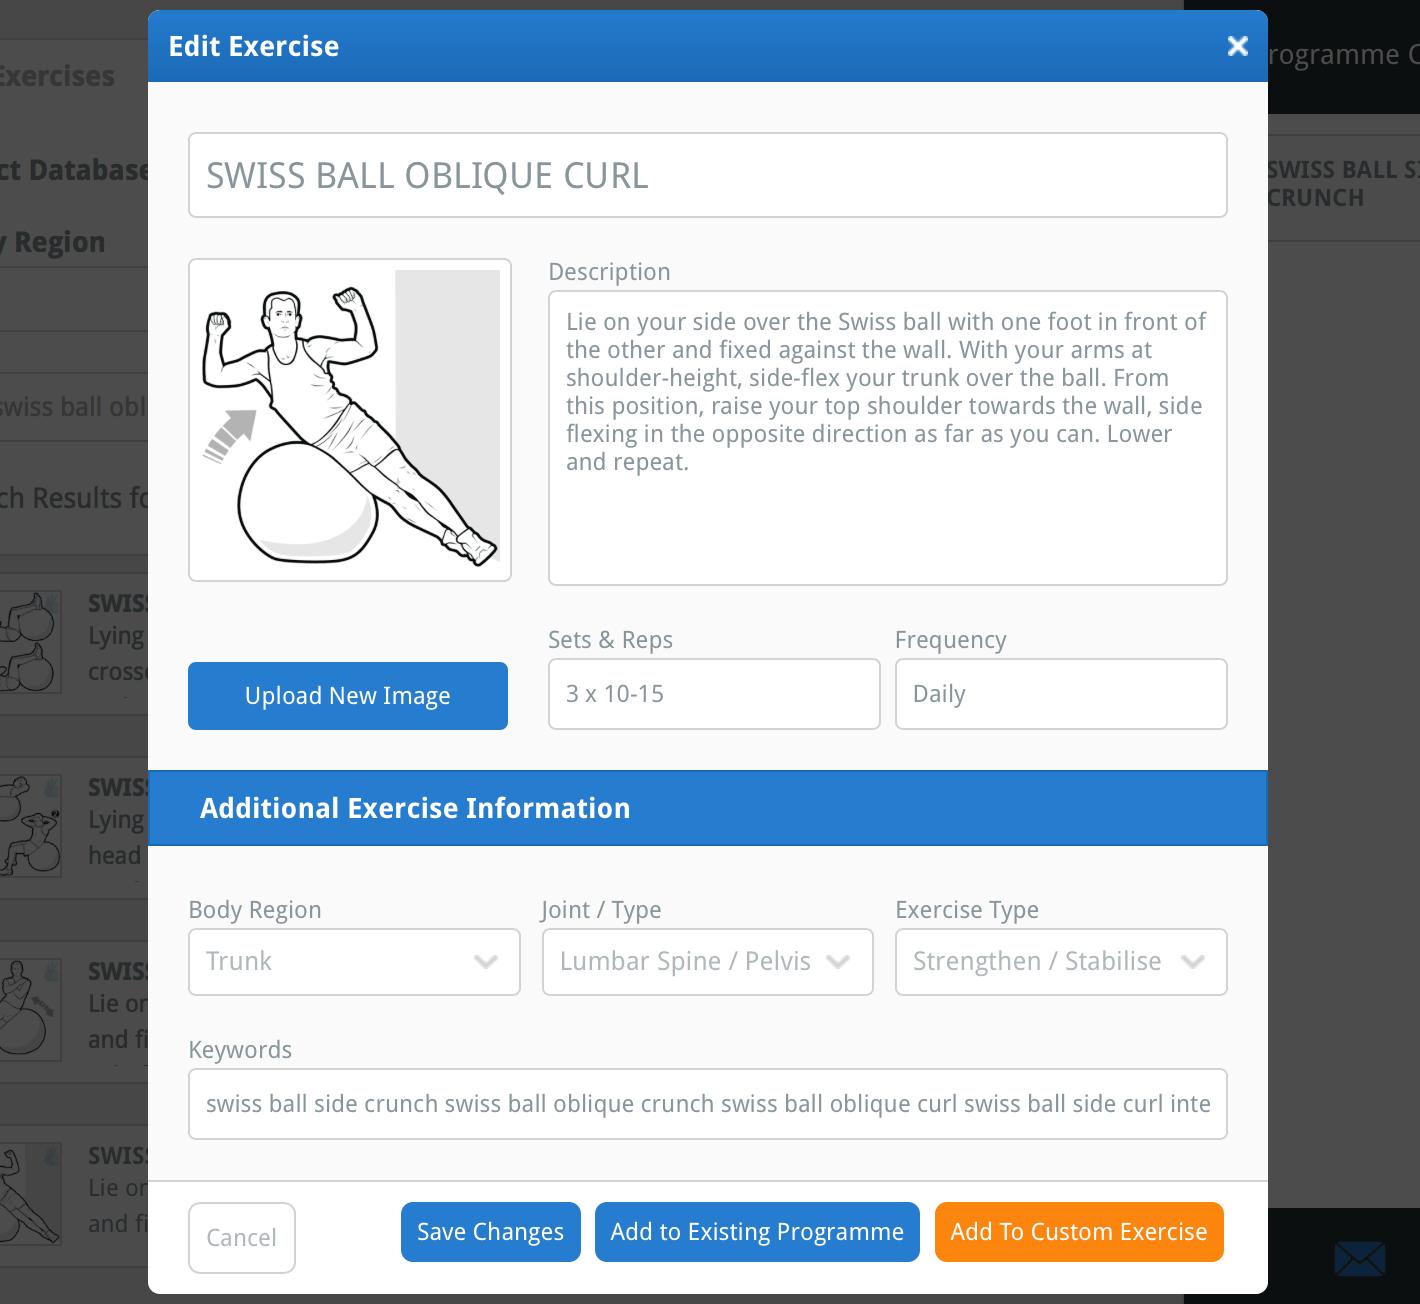 the Edit Exercise window